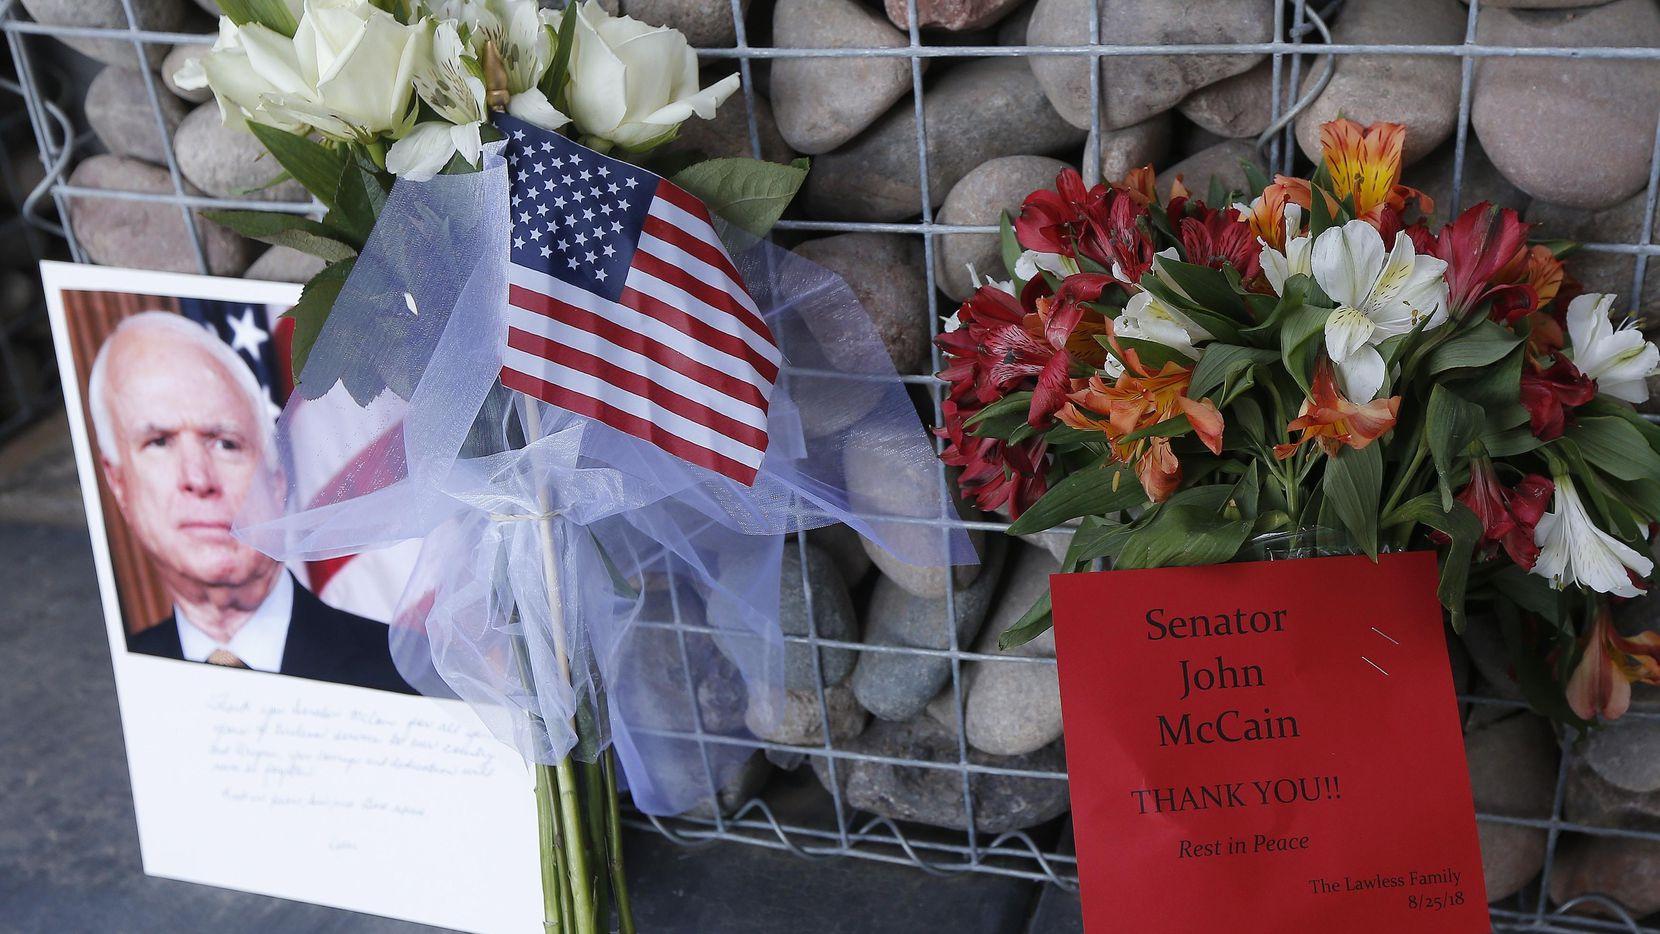 El público empezó a dejar cartelones de recordación afuera de la oficina del ex senador John McCain en Arizona.(AP)